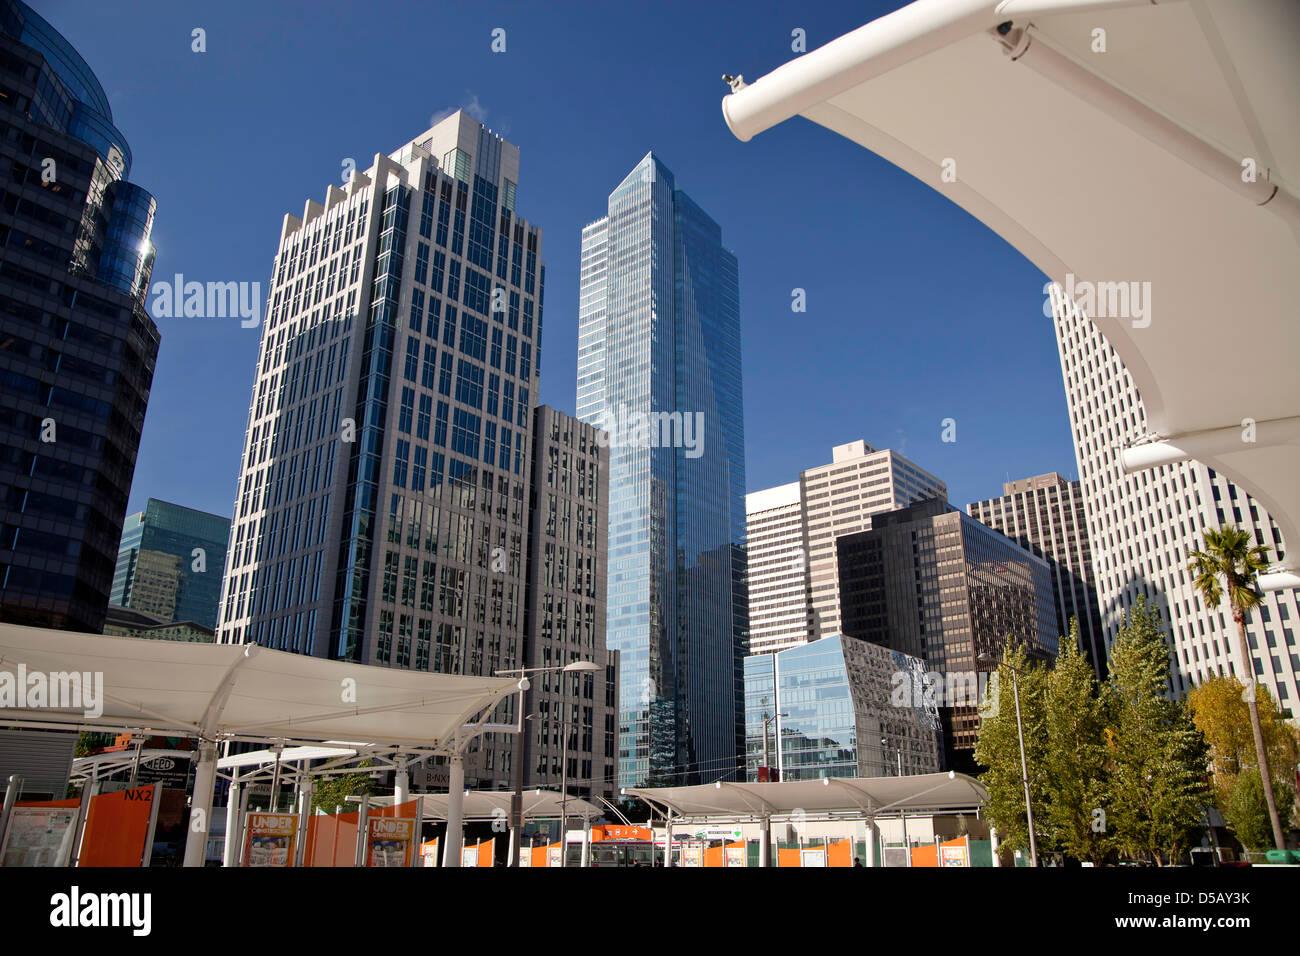 skyscraper of San Francisco Financial District, San Francisco, California, United States of America, USA - Stock Image